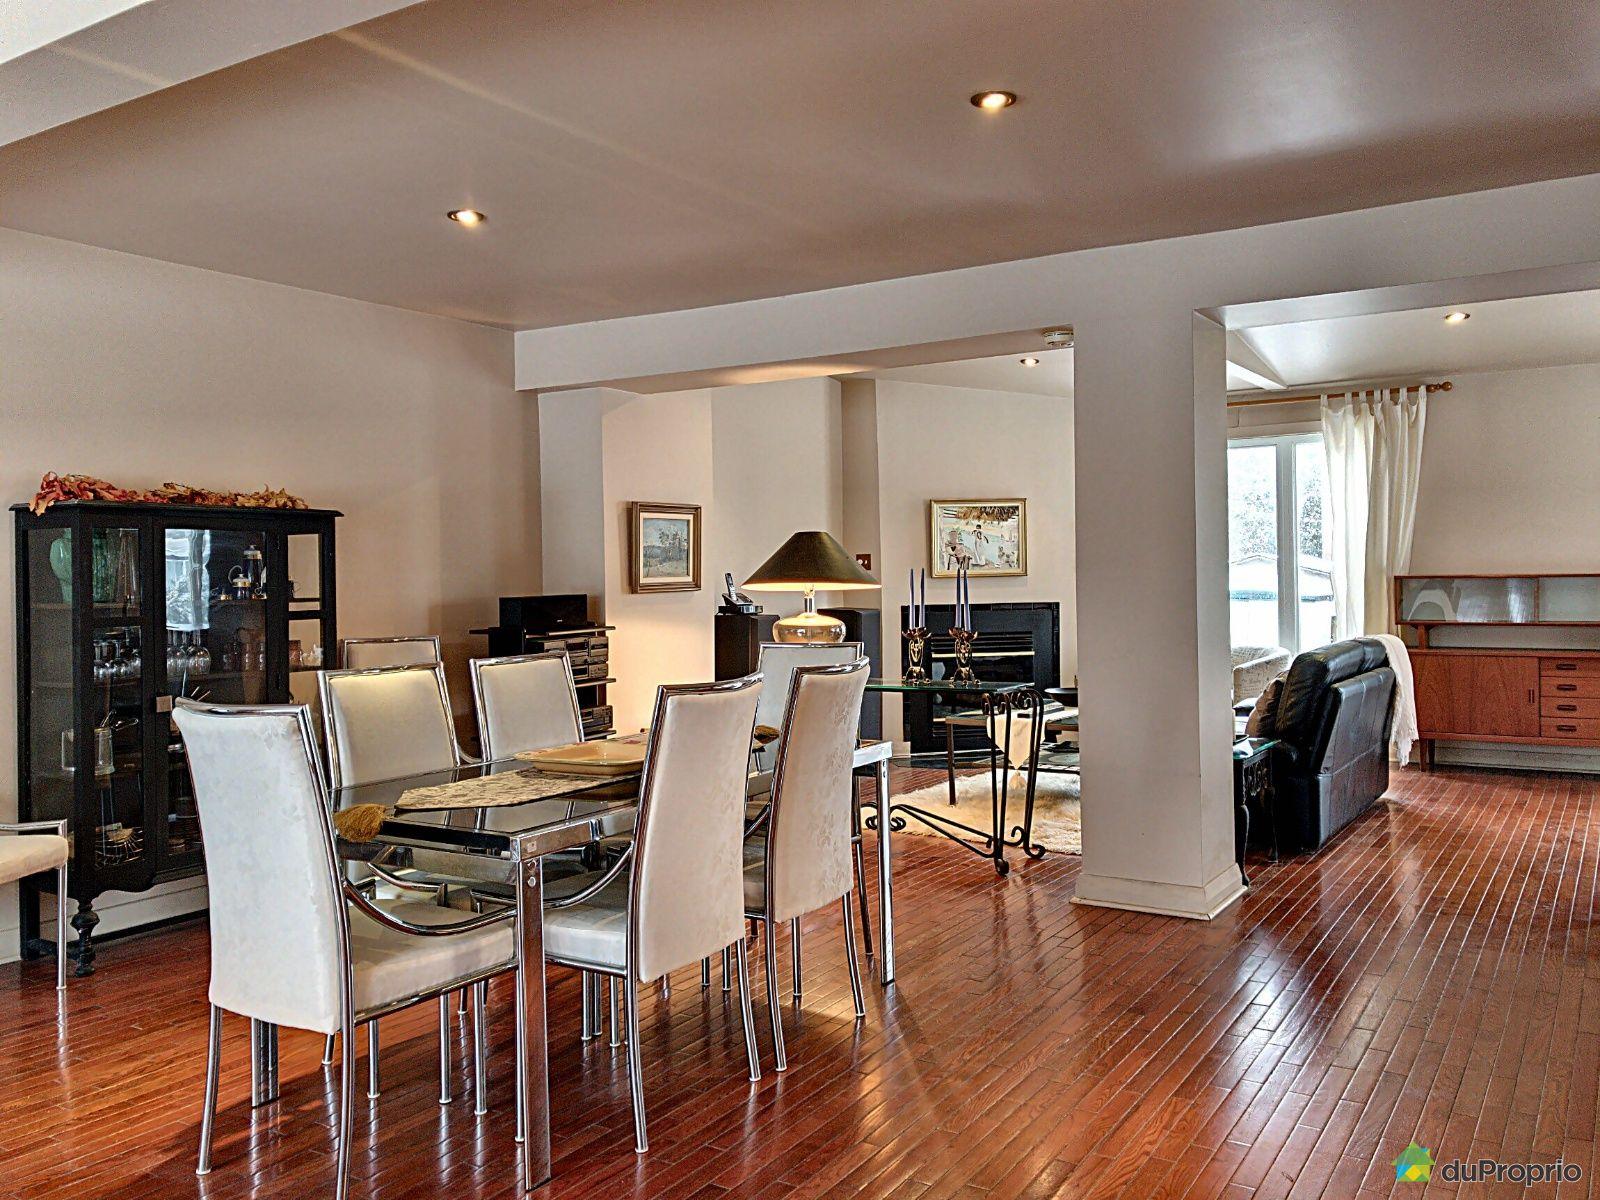 Living / Dining Room - 3390 rue Beauséjour, Saint-Laurent for sale